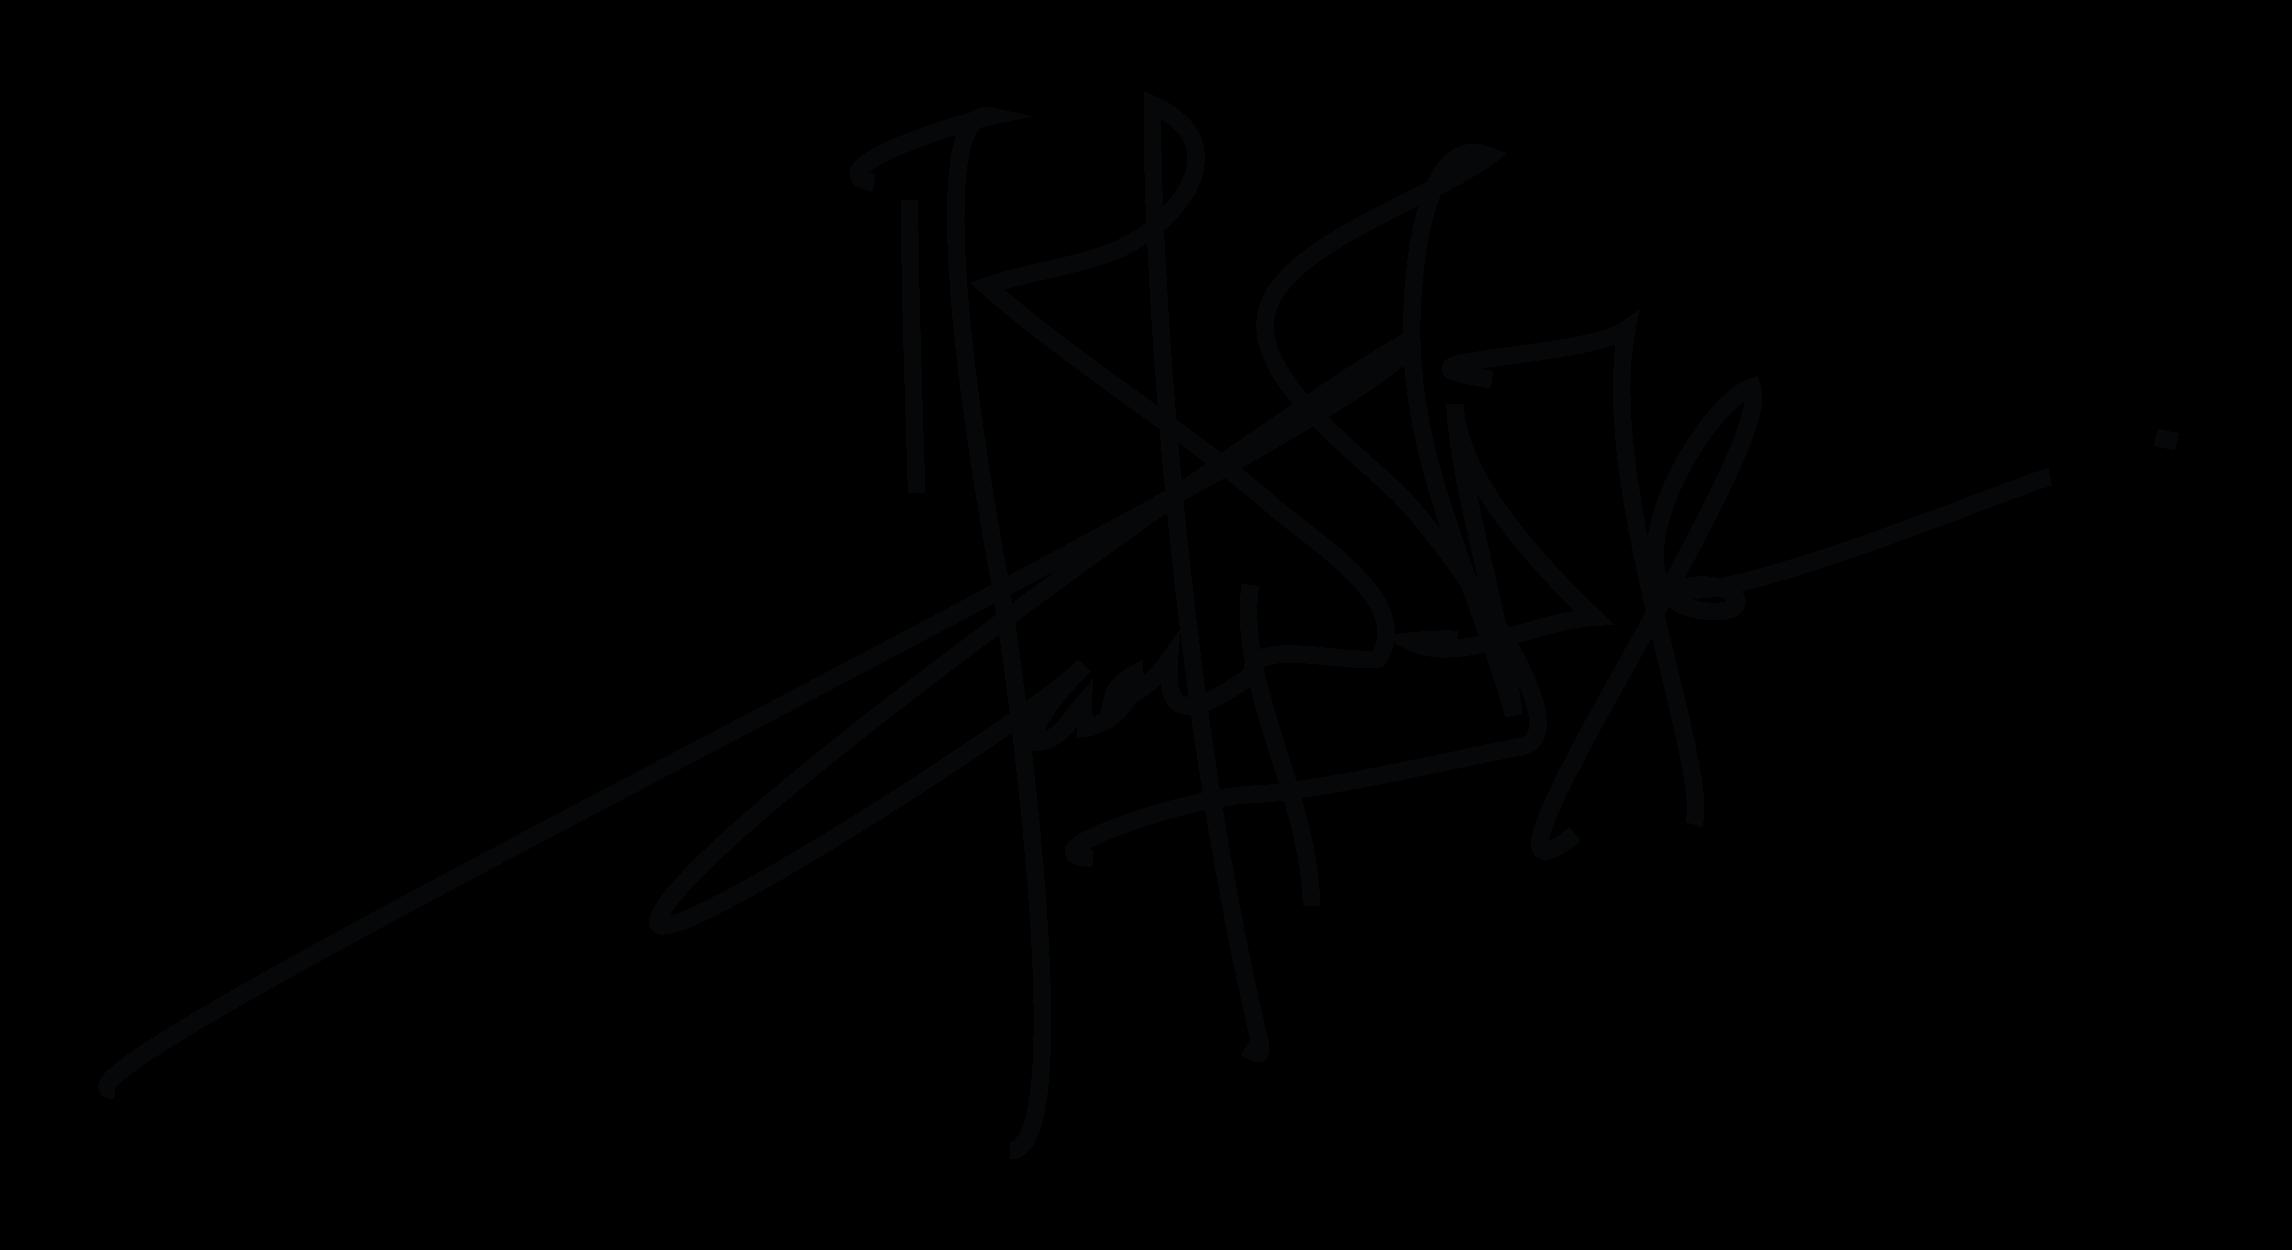 zhao tu's Signature